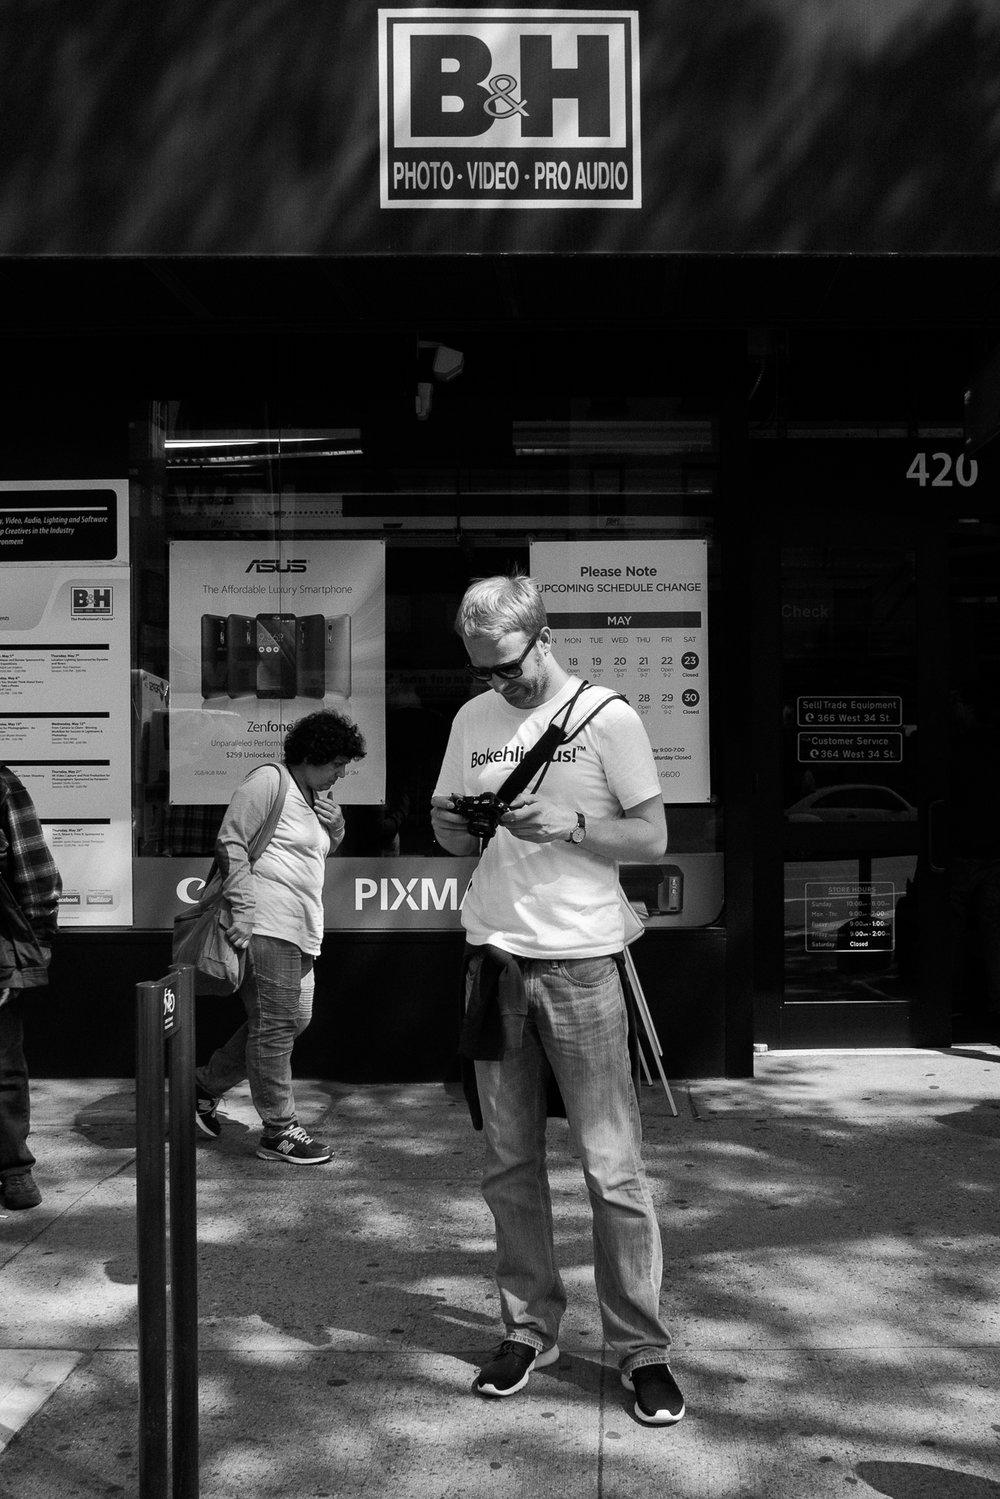 2015-05-14-NYC-1935.jpg